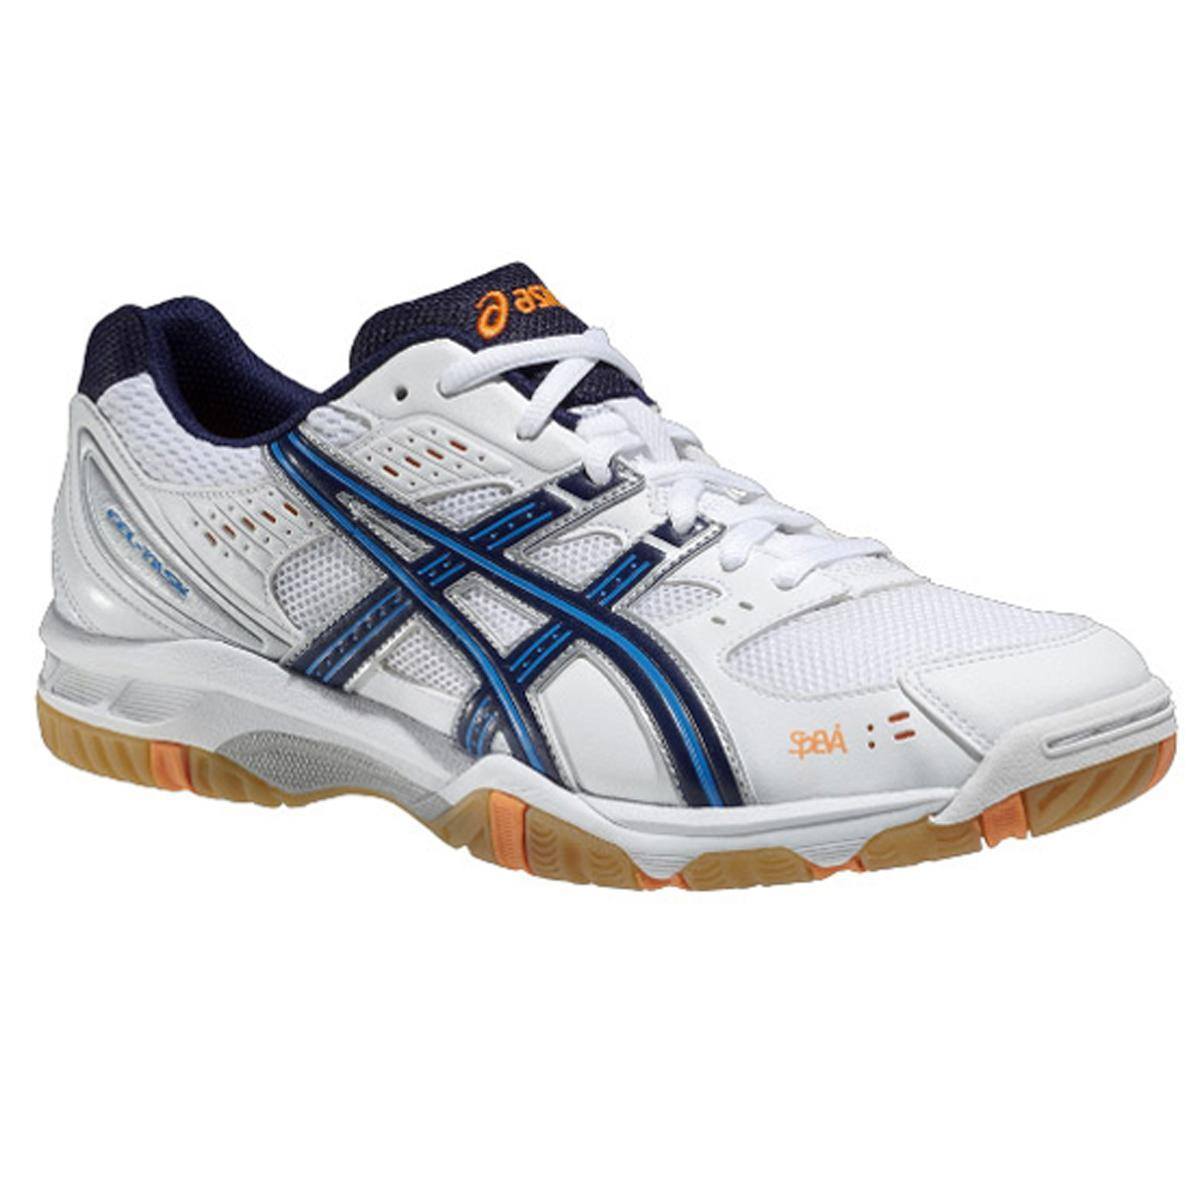 Asics Mens GEL Task Indoor SquashBadminton Shoes WhiteNavy